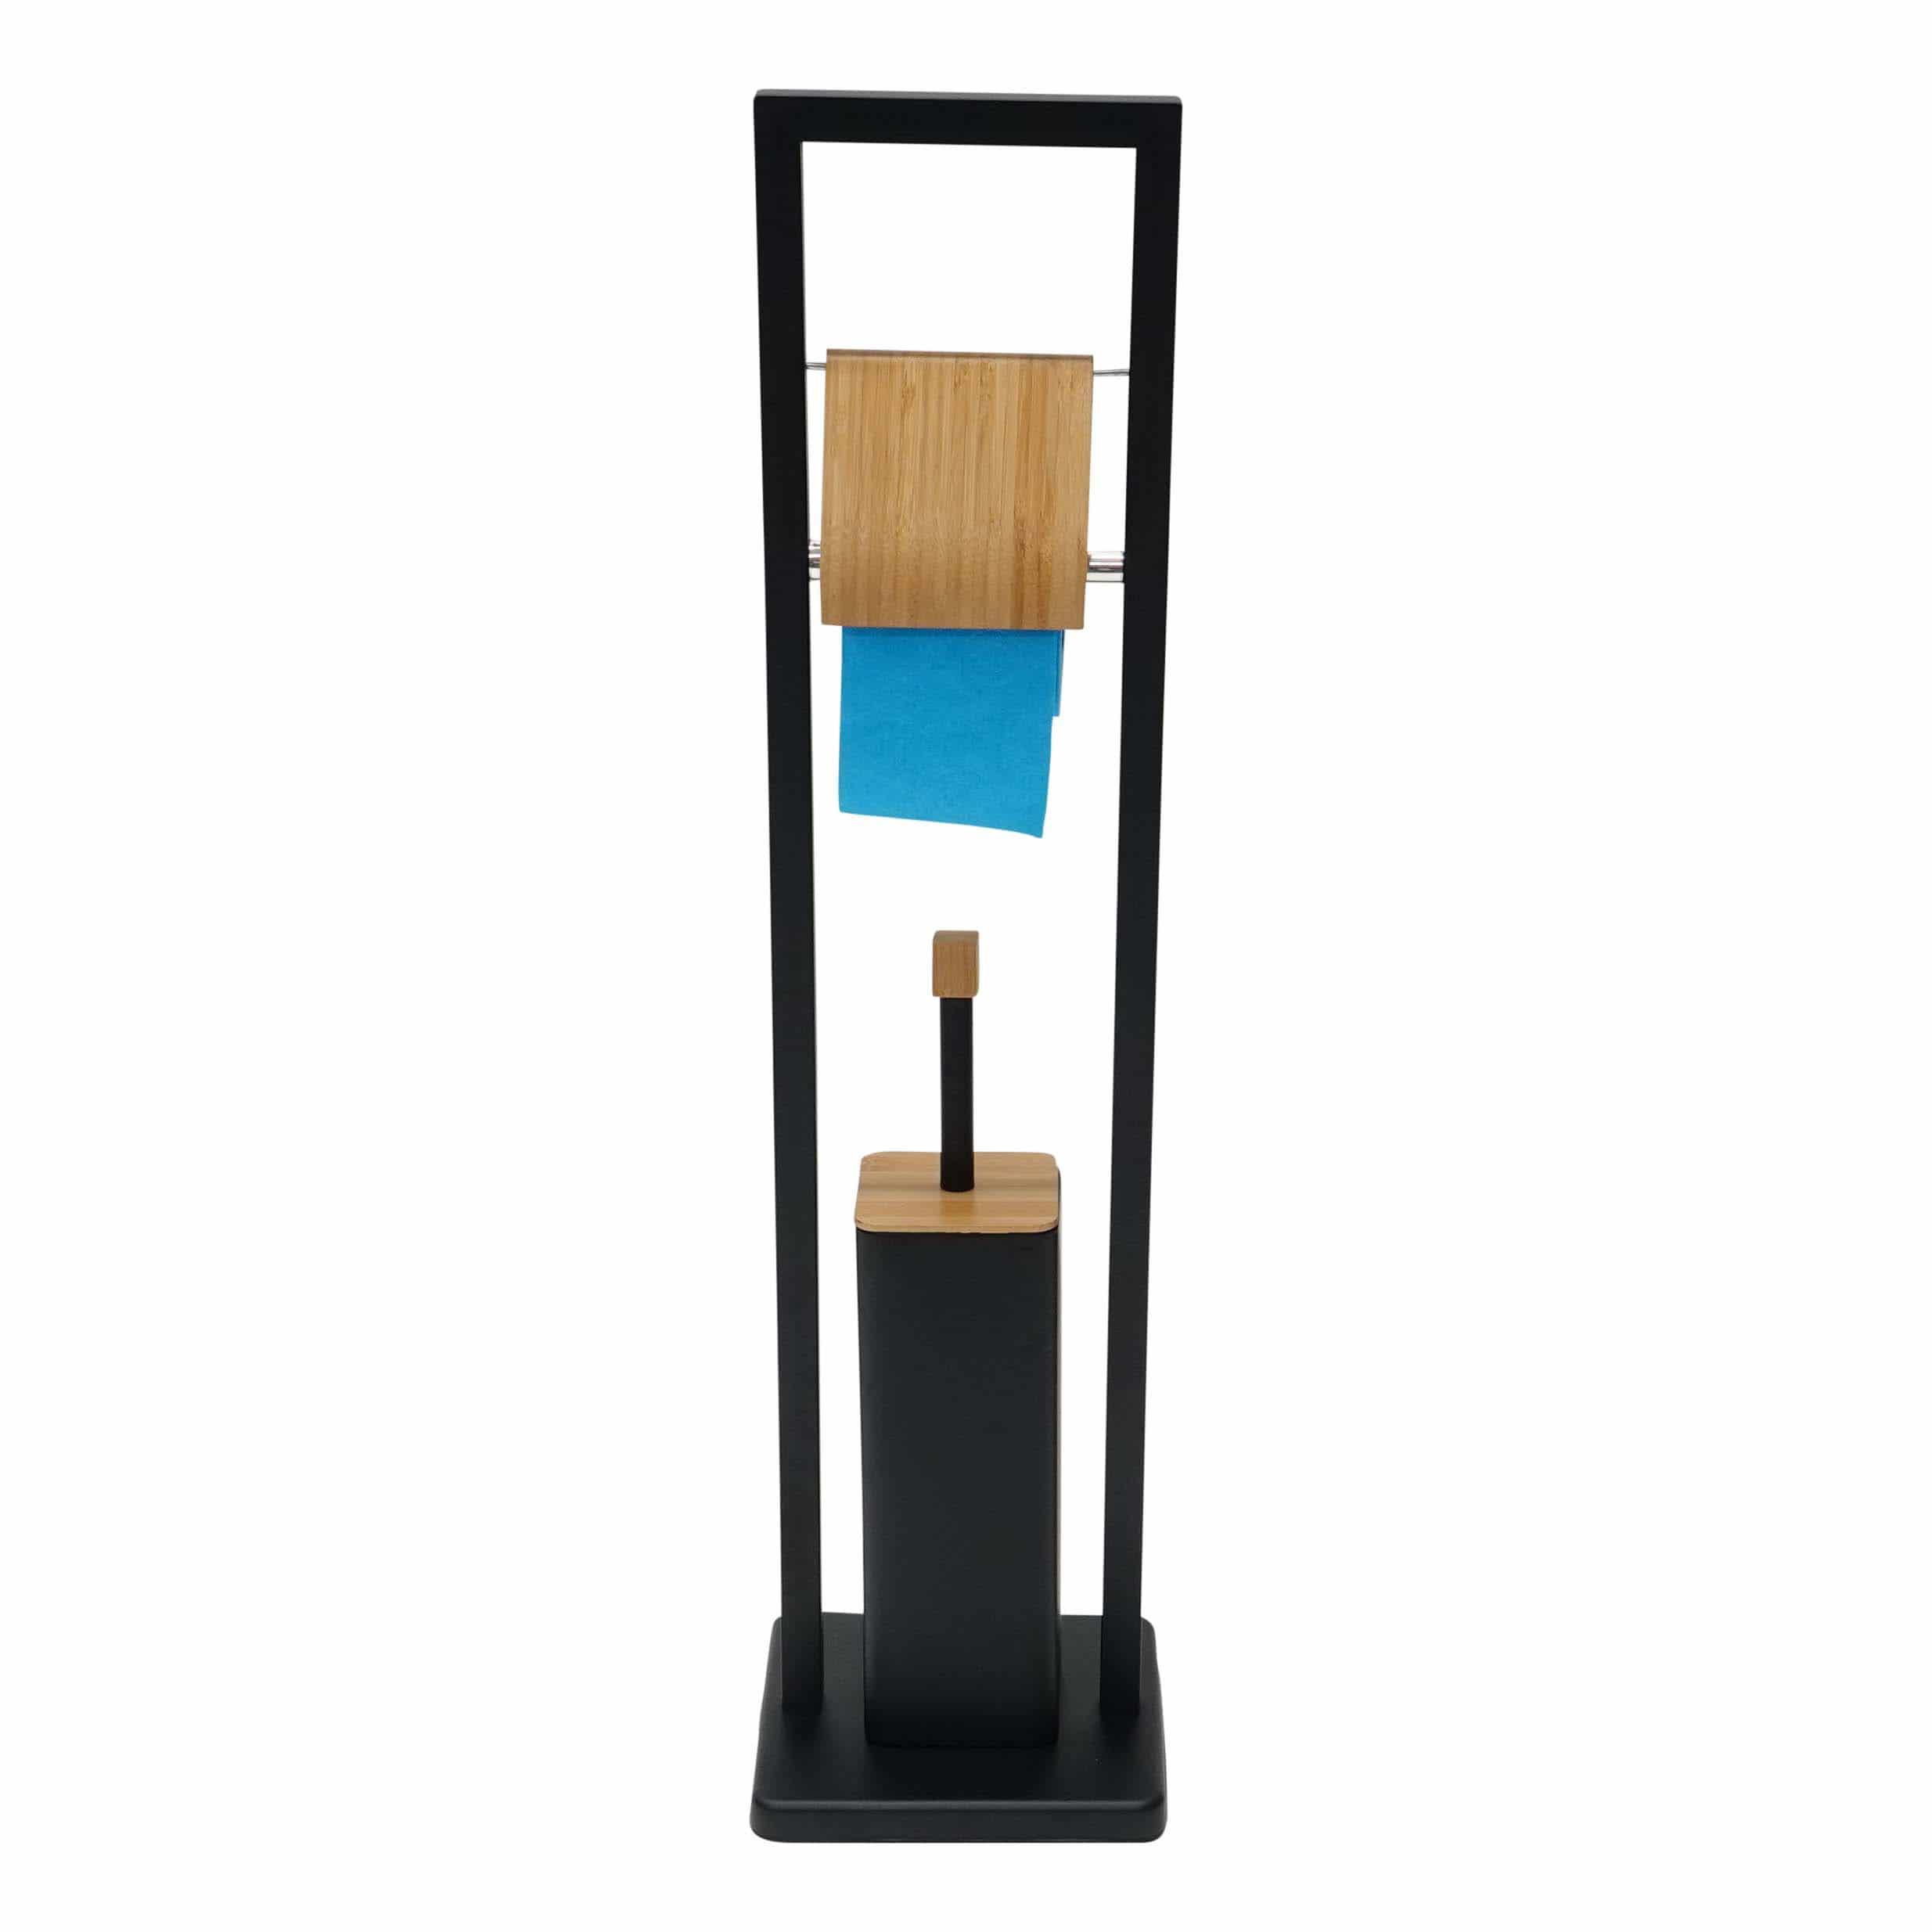 4goodz toiletgarnituur vrijstaand bamboe 20x20x60cm - Zwart